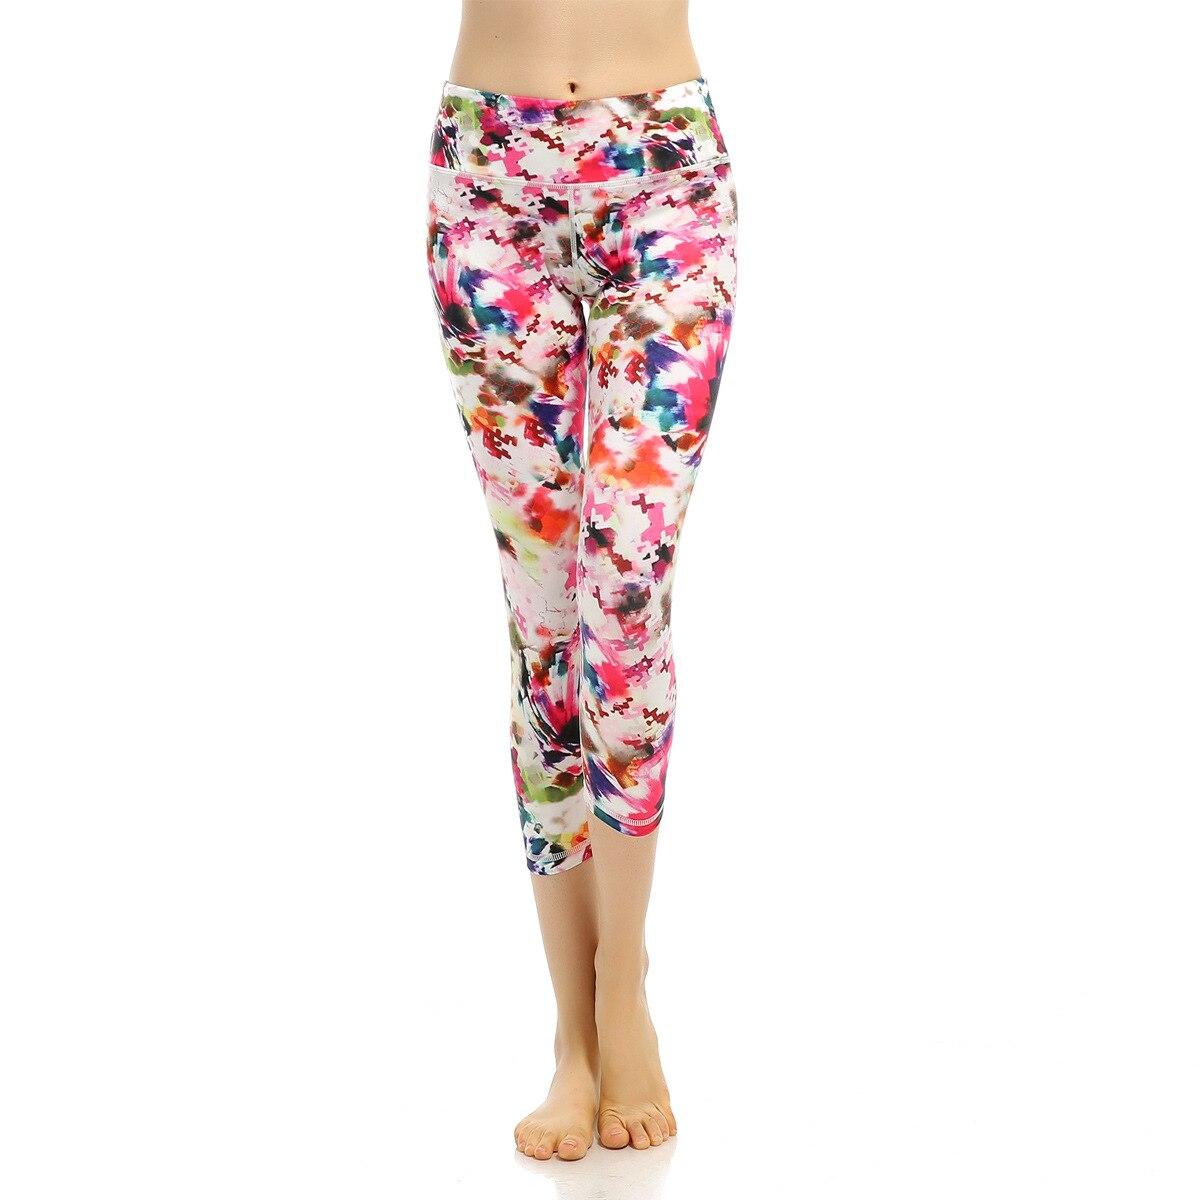 font b Women b font Yoga Leggings Elastic Comfortable Surper stretch Sport slimming Legging Workout